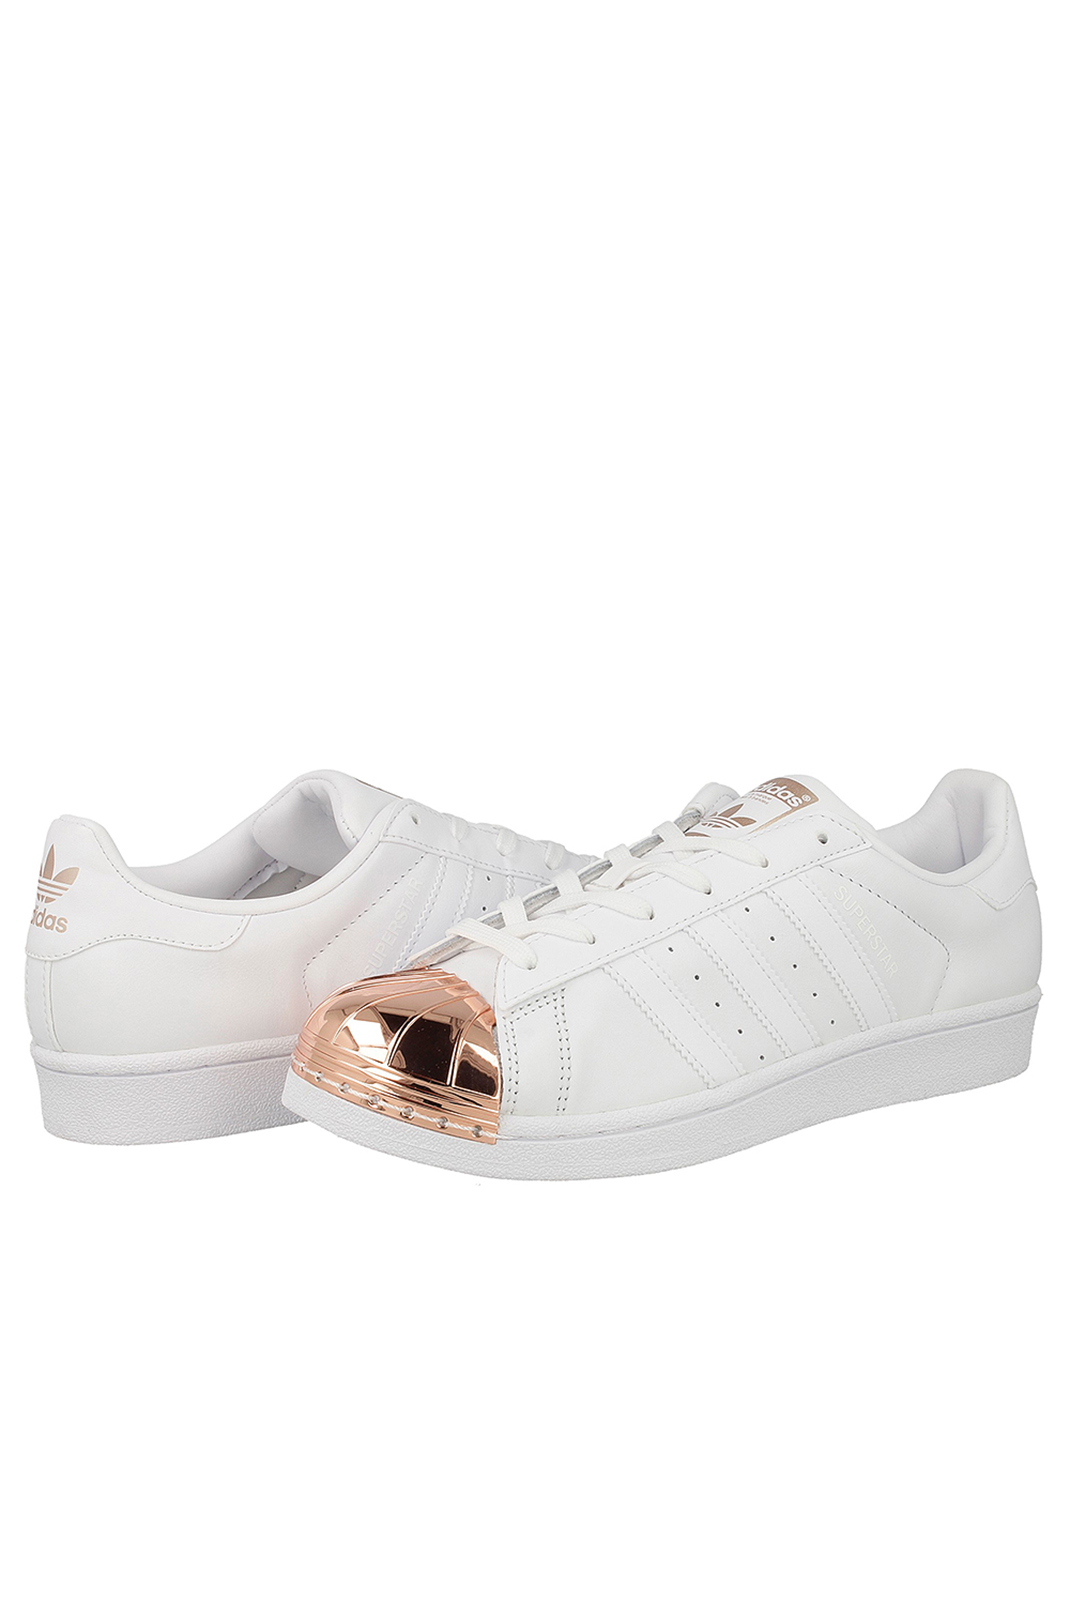 Baskets / Sneakers  Adidas BY2882 SUPERSTAR METAL TOE BLANC